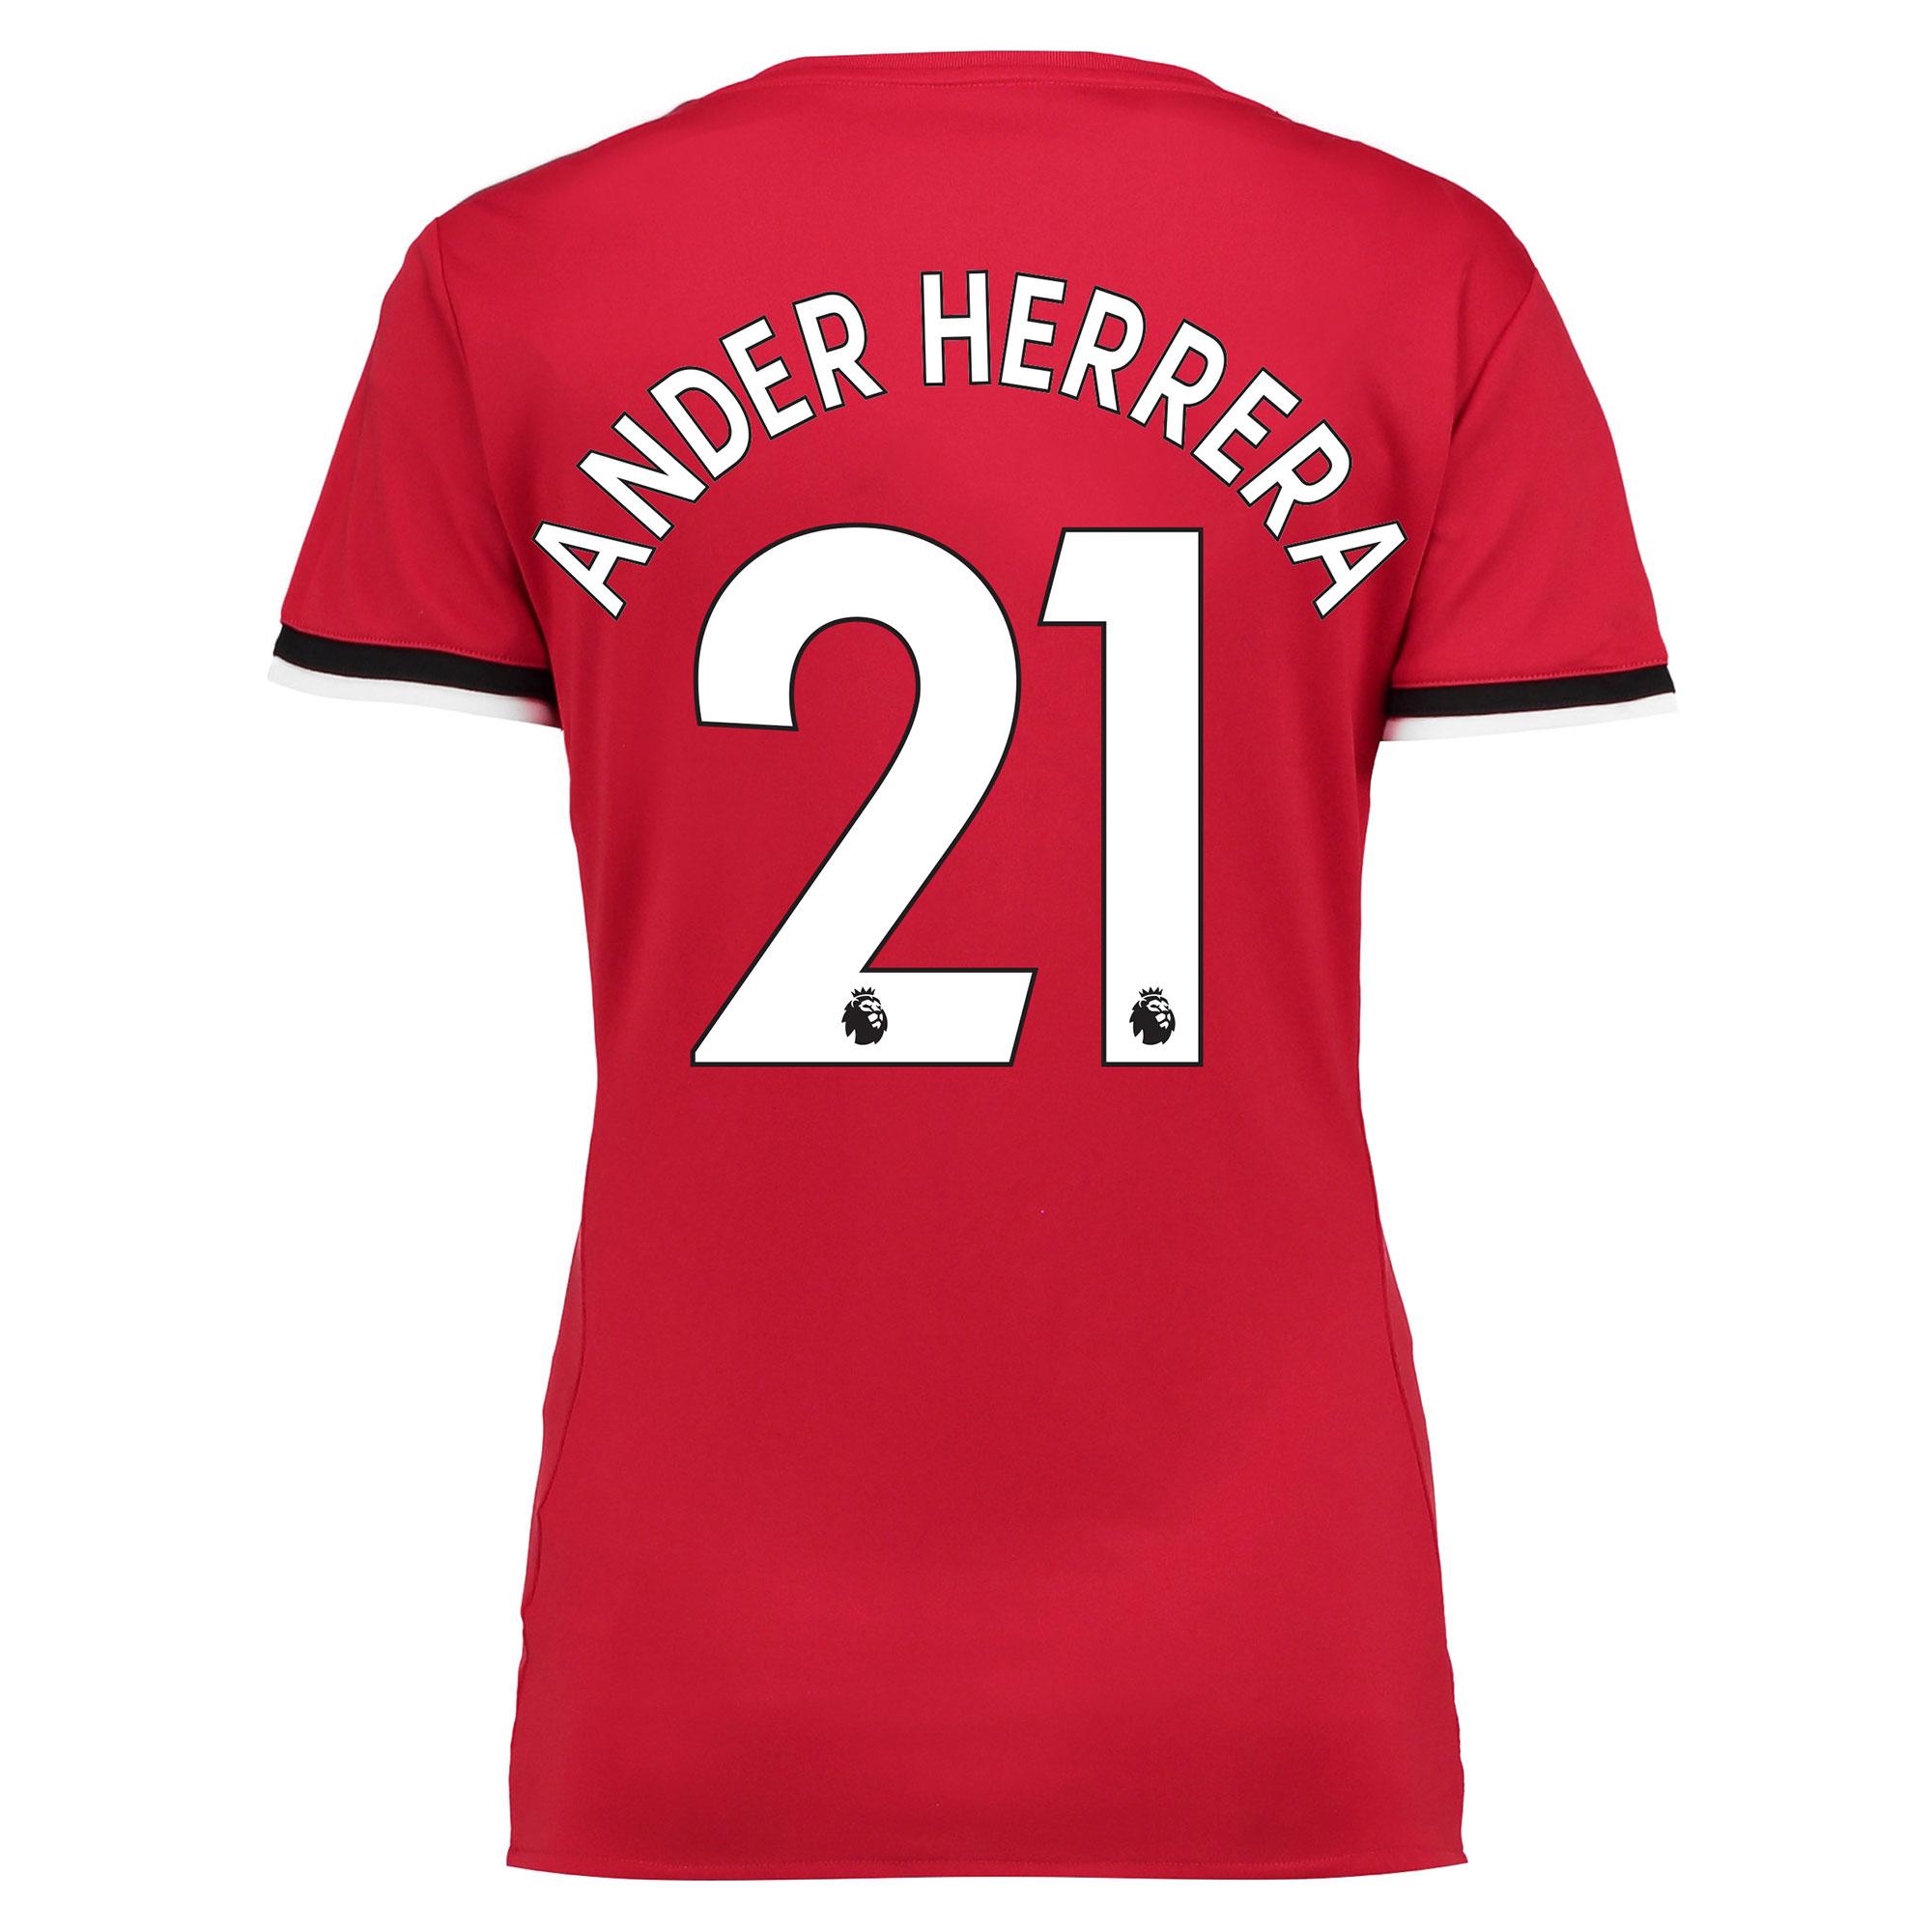 Manchester United Home Shirt 2017-18 - Womens with Ander Herrera 21 pr